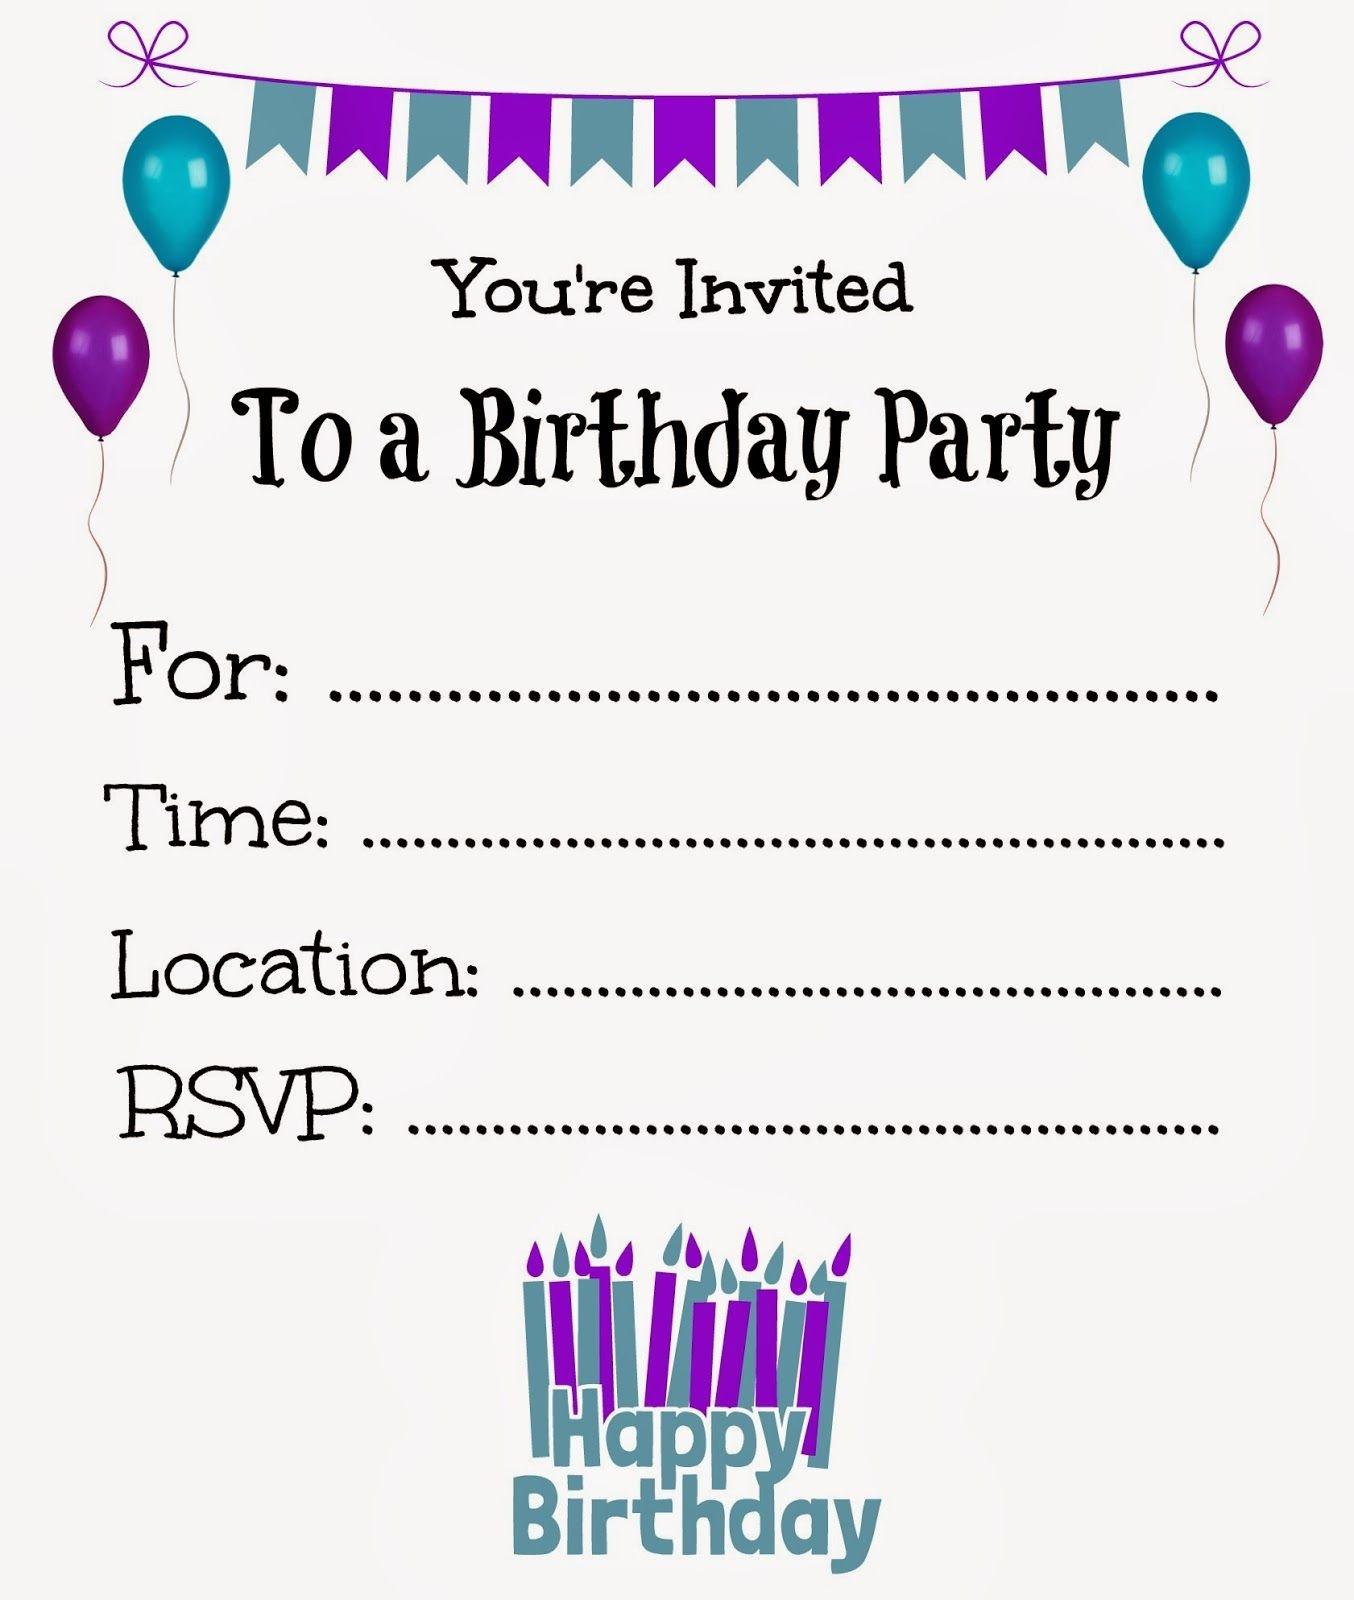 Free Printable Birthday Invitations For Kids #freeprintables - Free Printable Birthday Invitation Cards